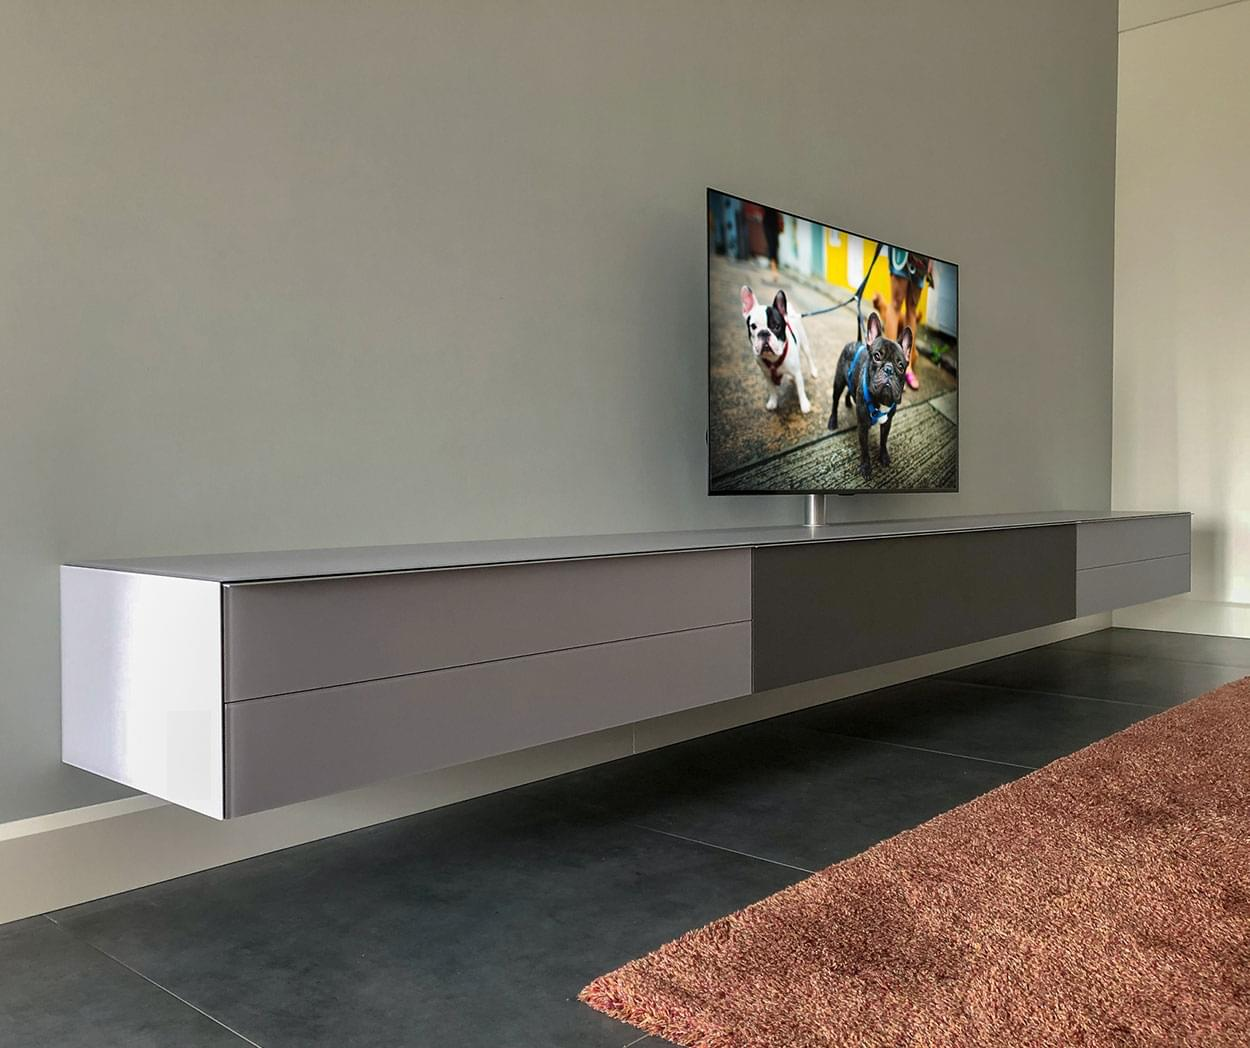 Design Tv Meubel Kast.Design Tv Meubels Kwaliteit Van Spectral Nl